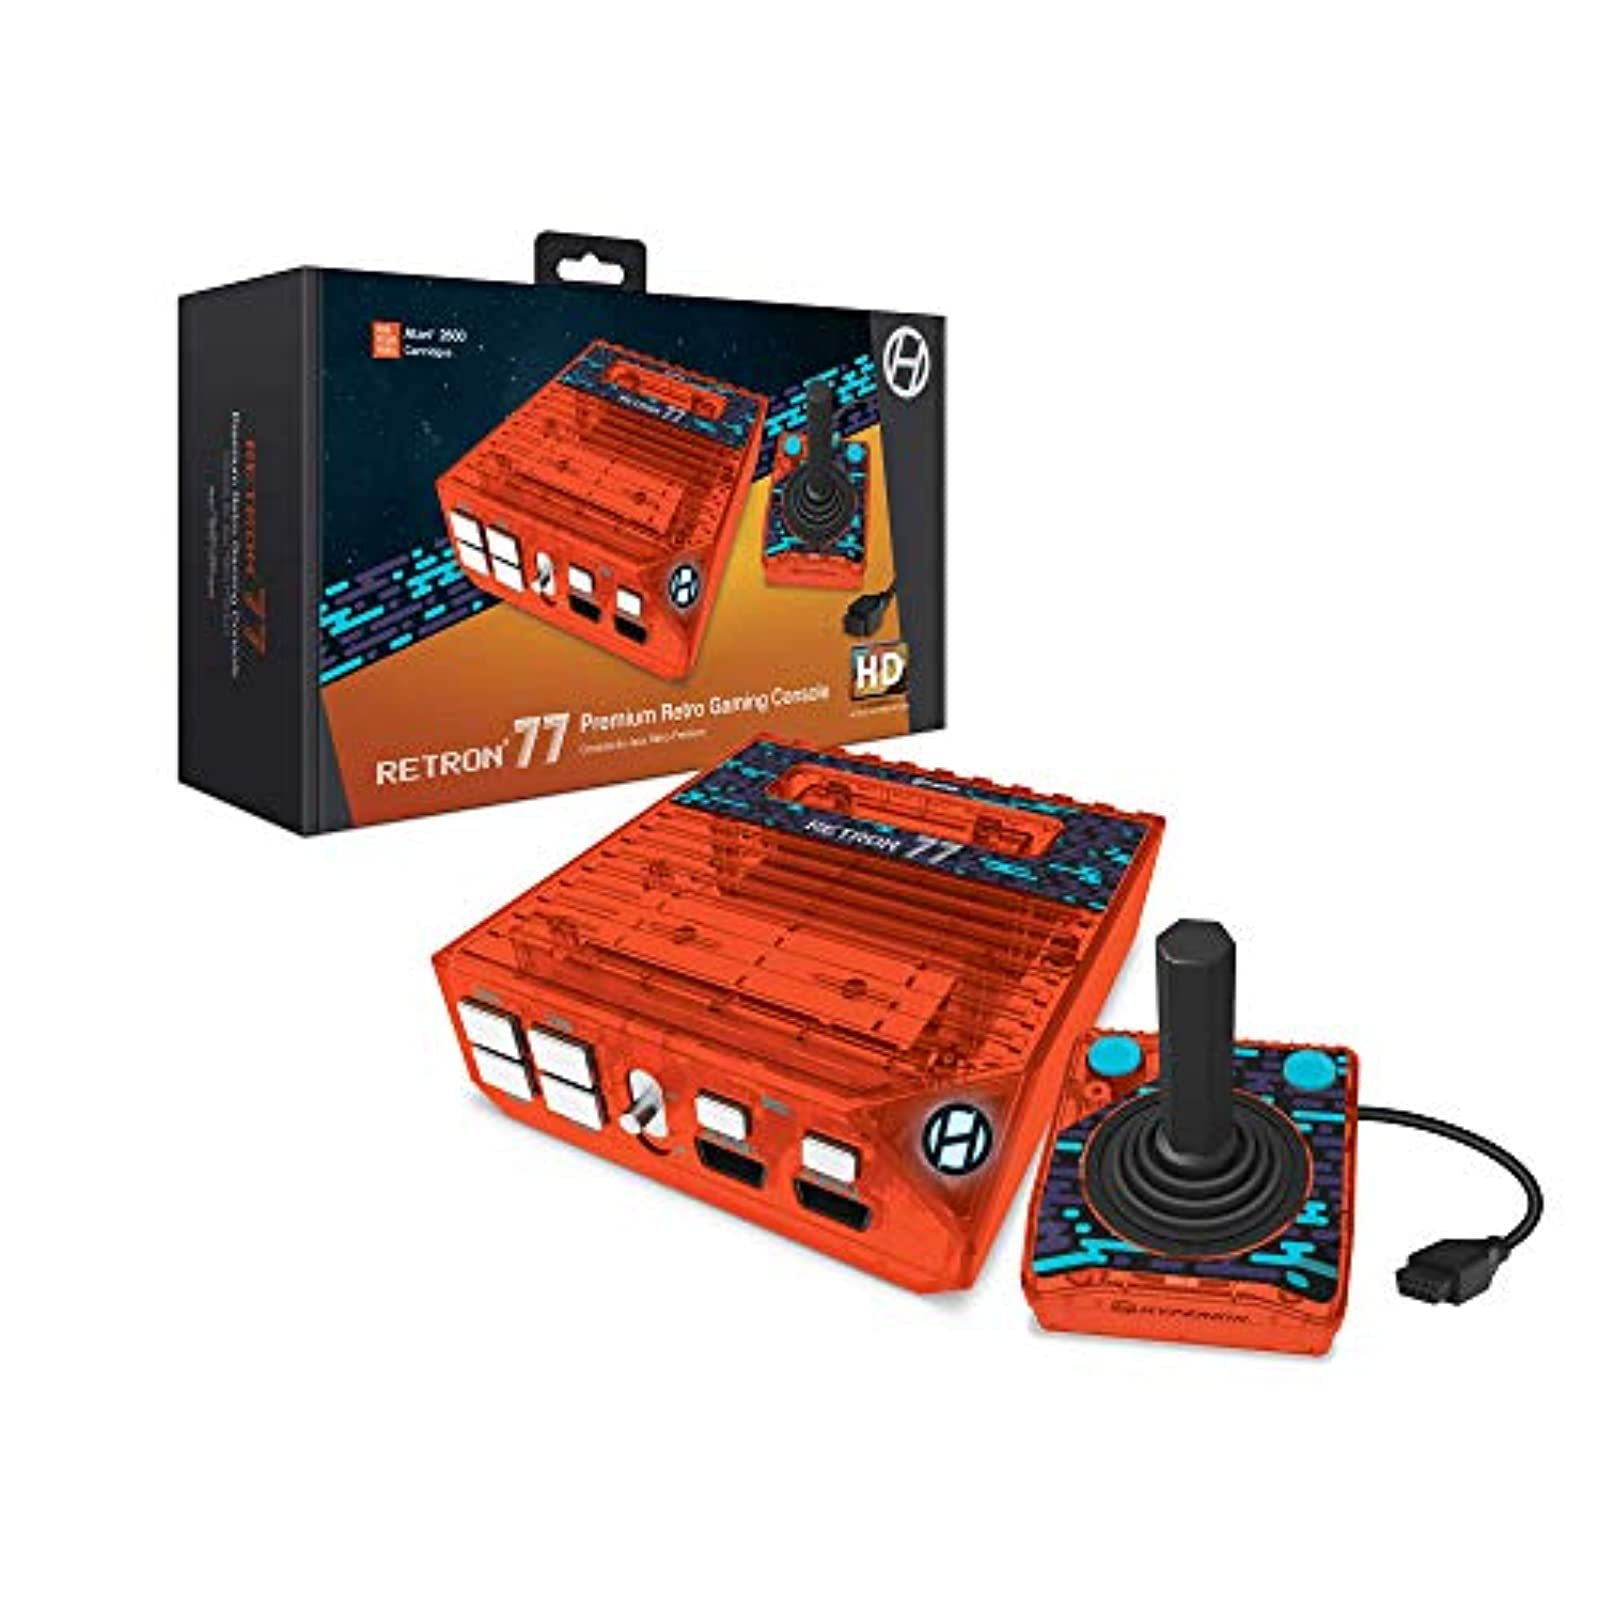 Hyperkin Retron 77: HD Gaming Console For Atari 2600 Retro Amber Not